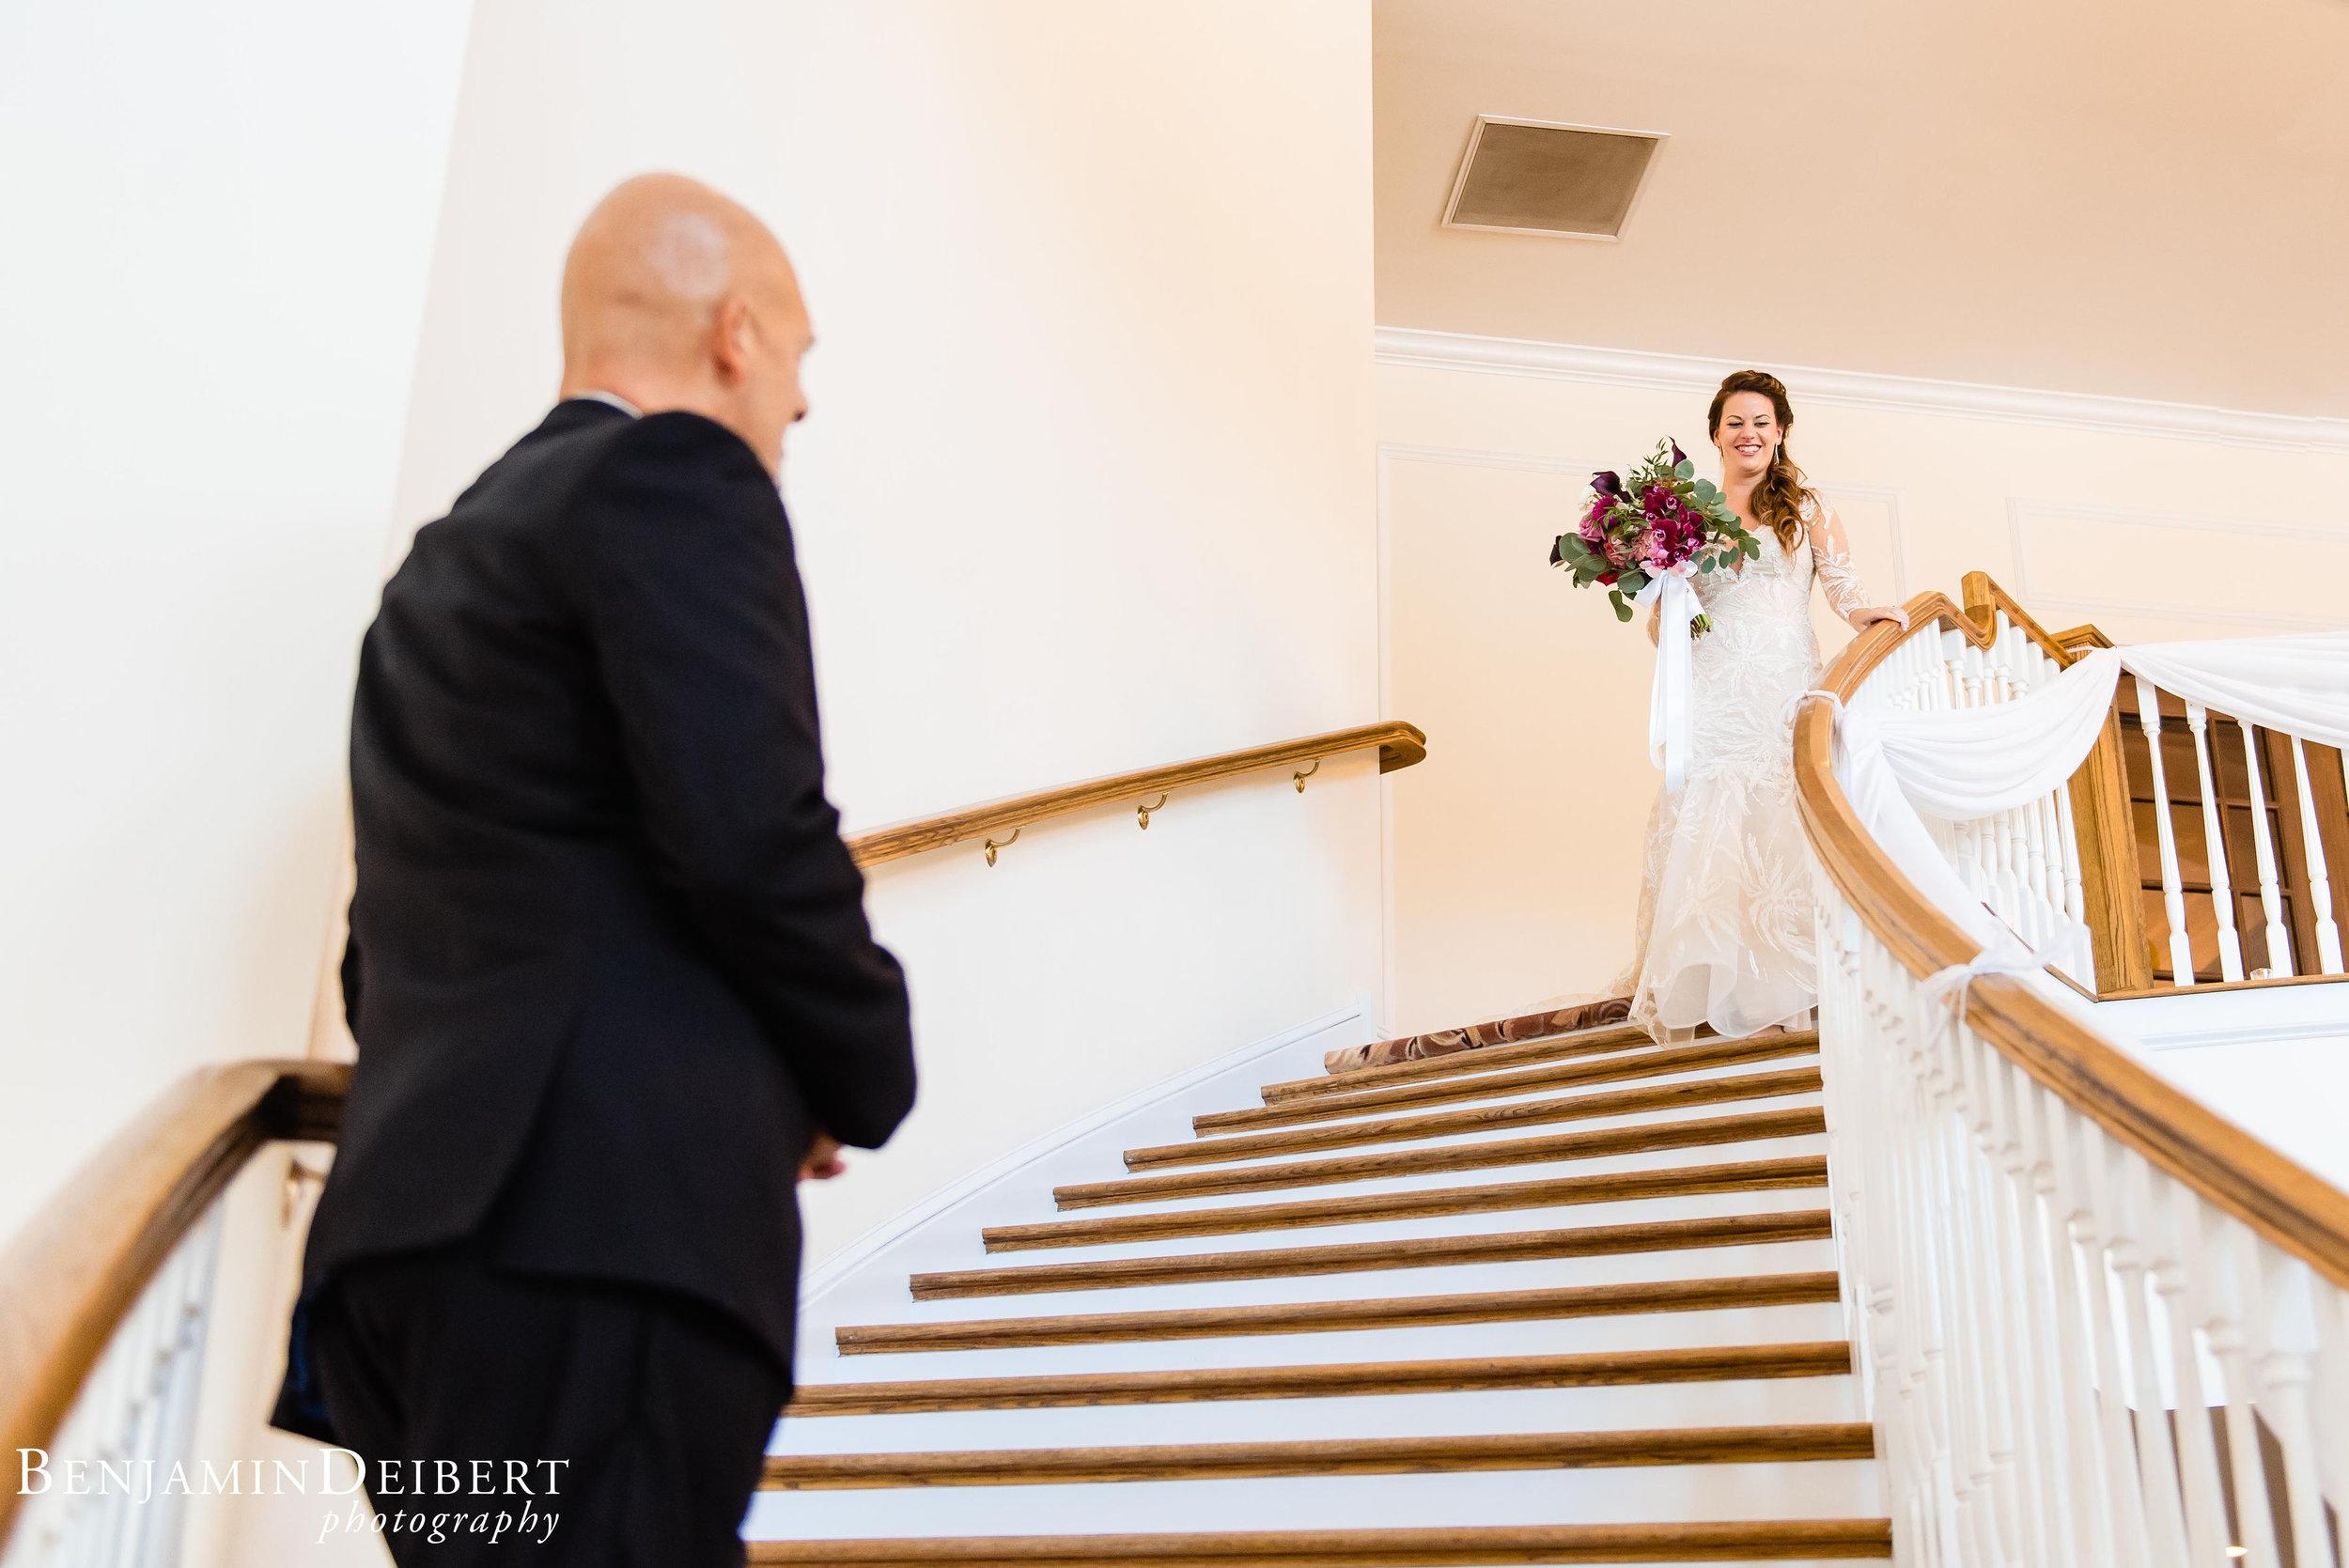 AmandaandElliott_TheCarriageHouse_Wedding-31.jpg